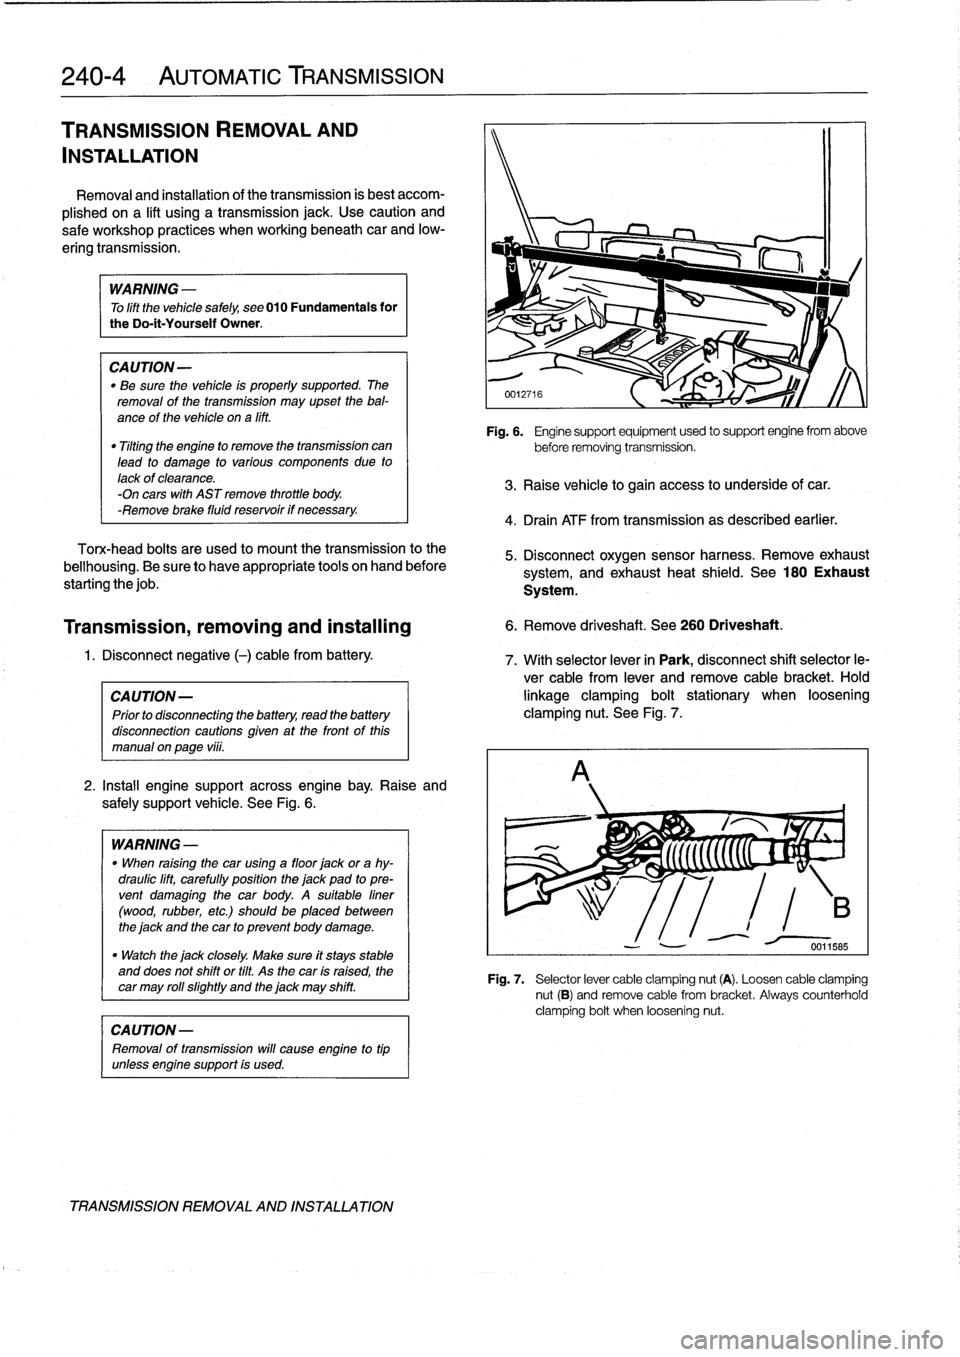 triumph tr4 tr4a workshop manual owners manual official workshop manuals by brooklands books ltd 1961 03 20